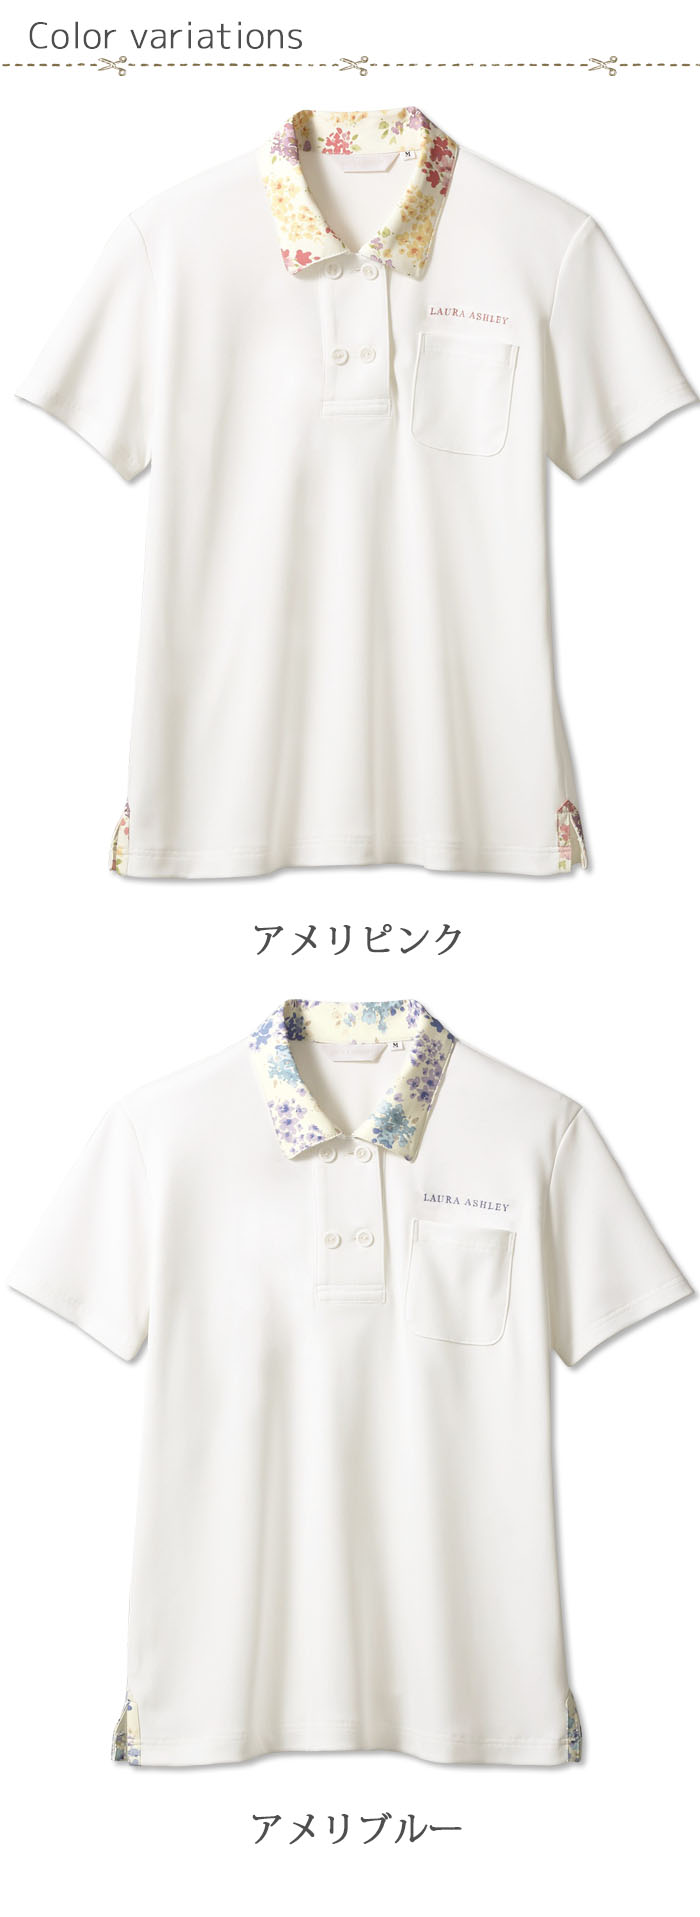 LW202 ニットシャツ カラー画像